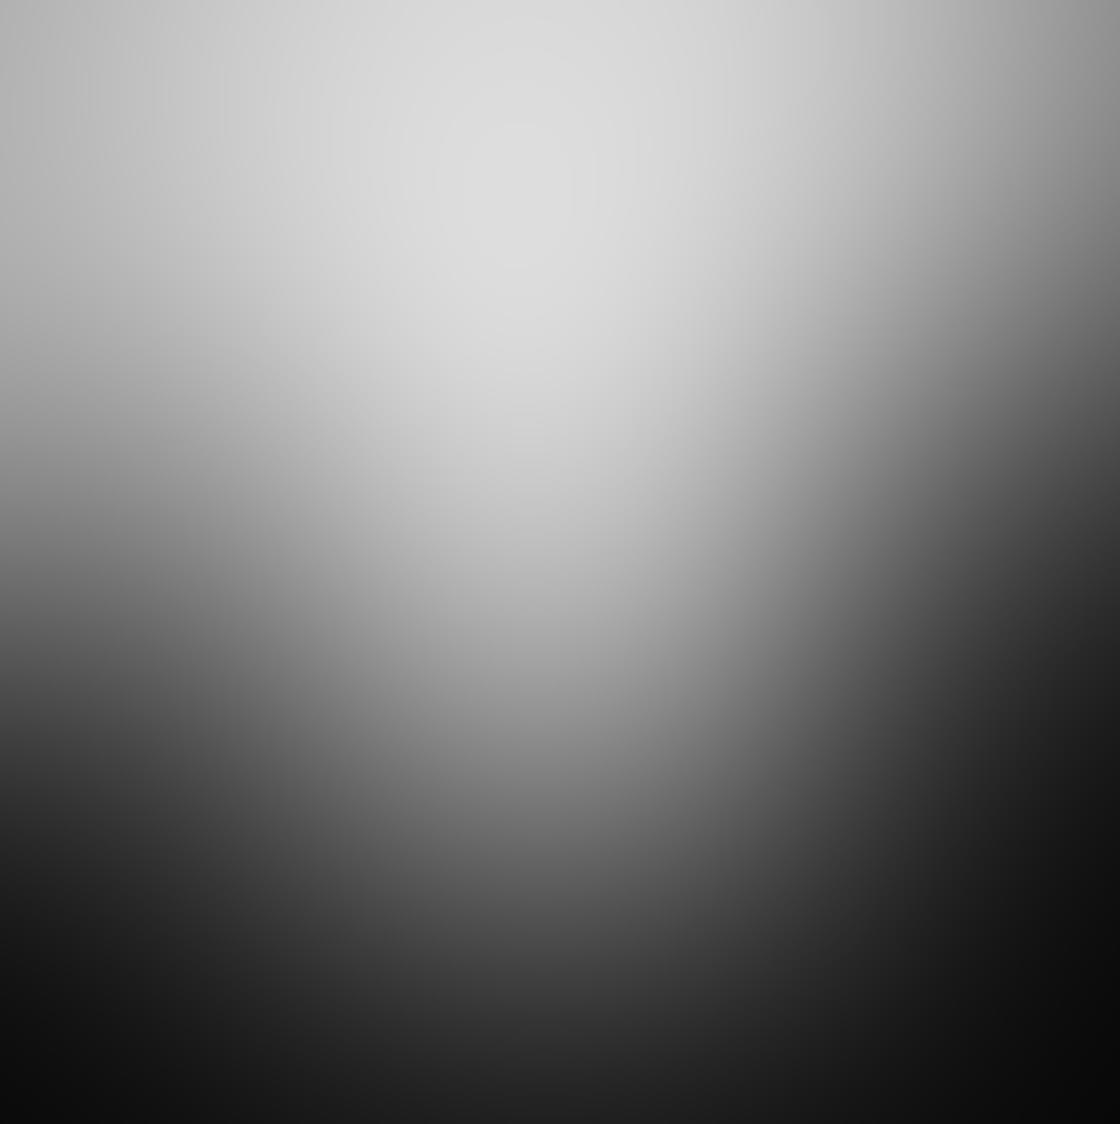 iPhone Photos Negative Space 28